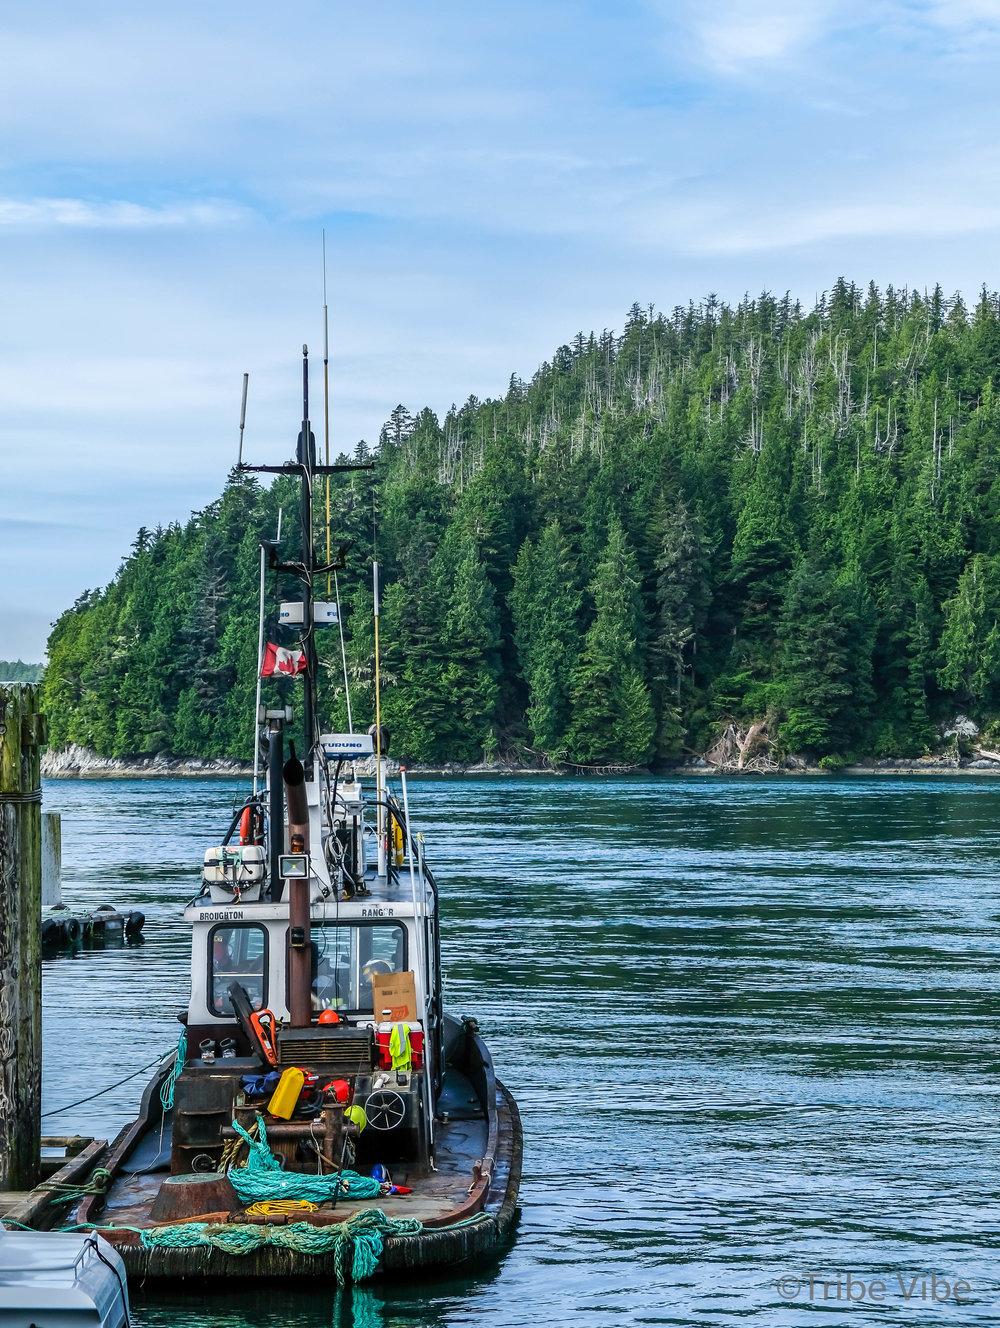 An iconic Canadian West Coast image